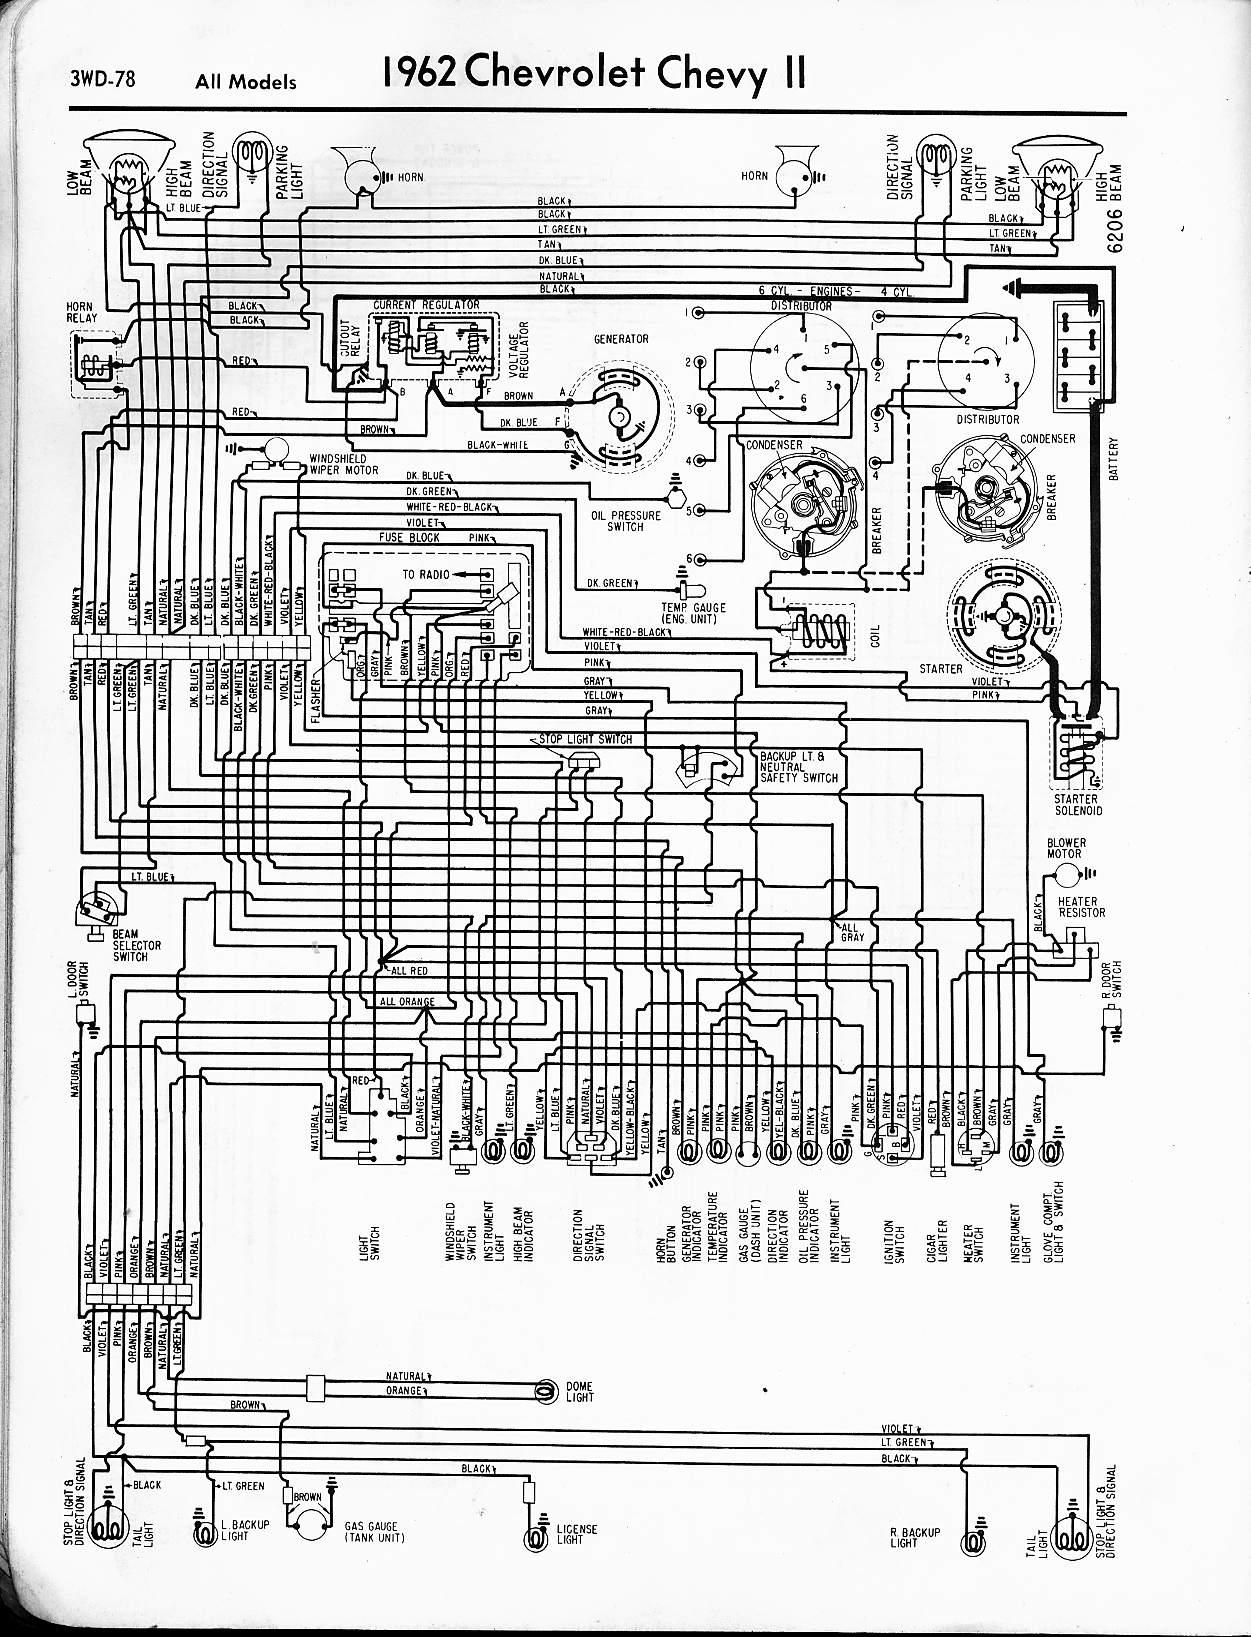 corvette wiring diagram image 1969 corvette wiring diagrams 1969 auto wiring diagram on 1969 corvette wiring diagram